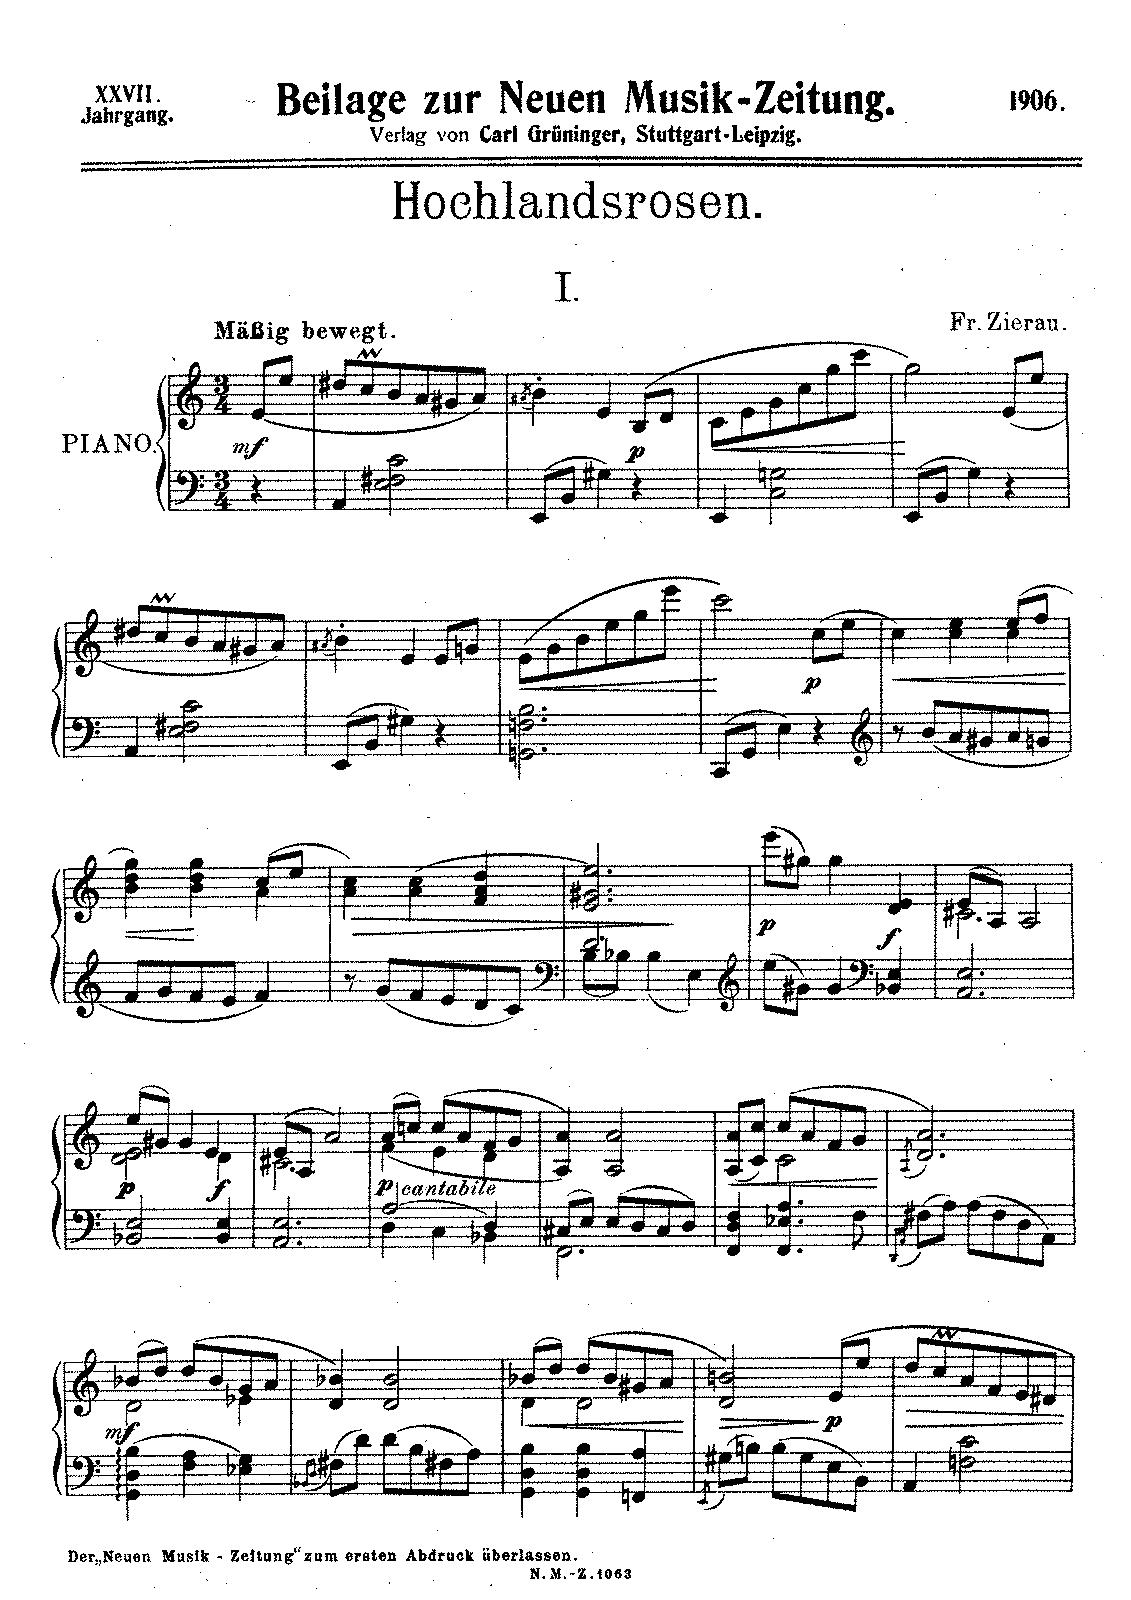 Hochlandsrosen (Zierau, Fritz) - IMSLP/Petrucci Music Library: Free